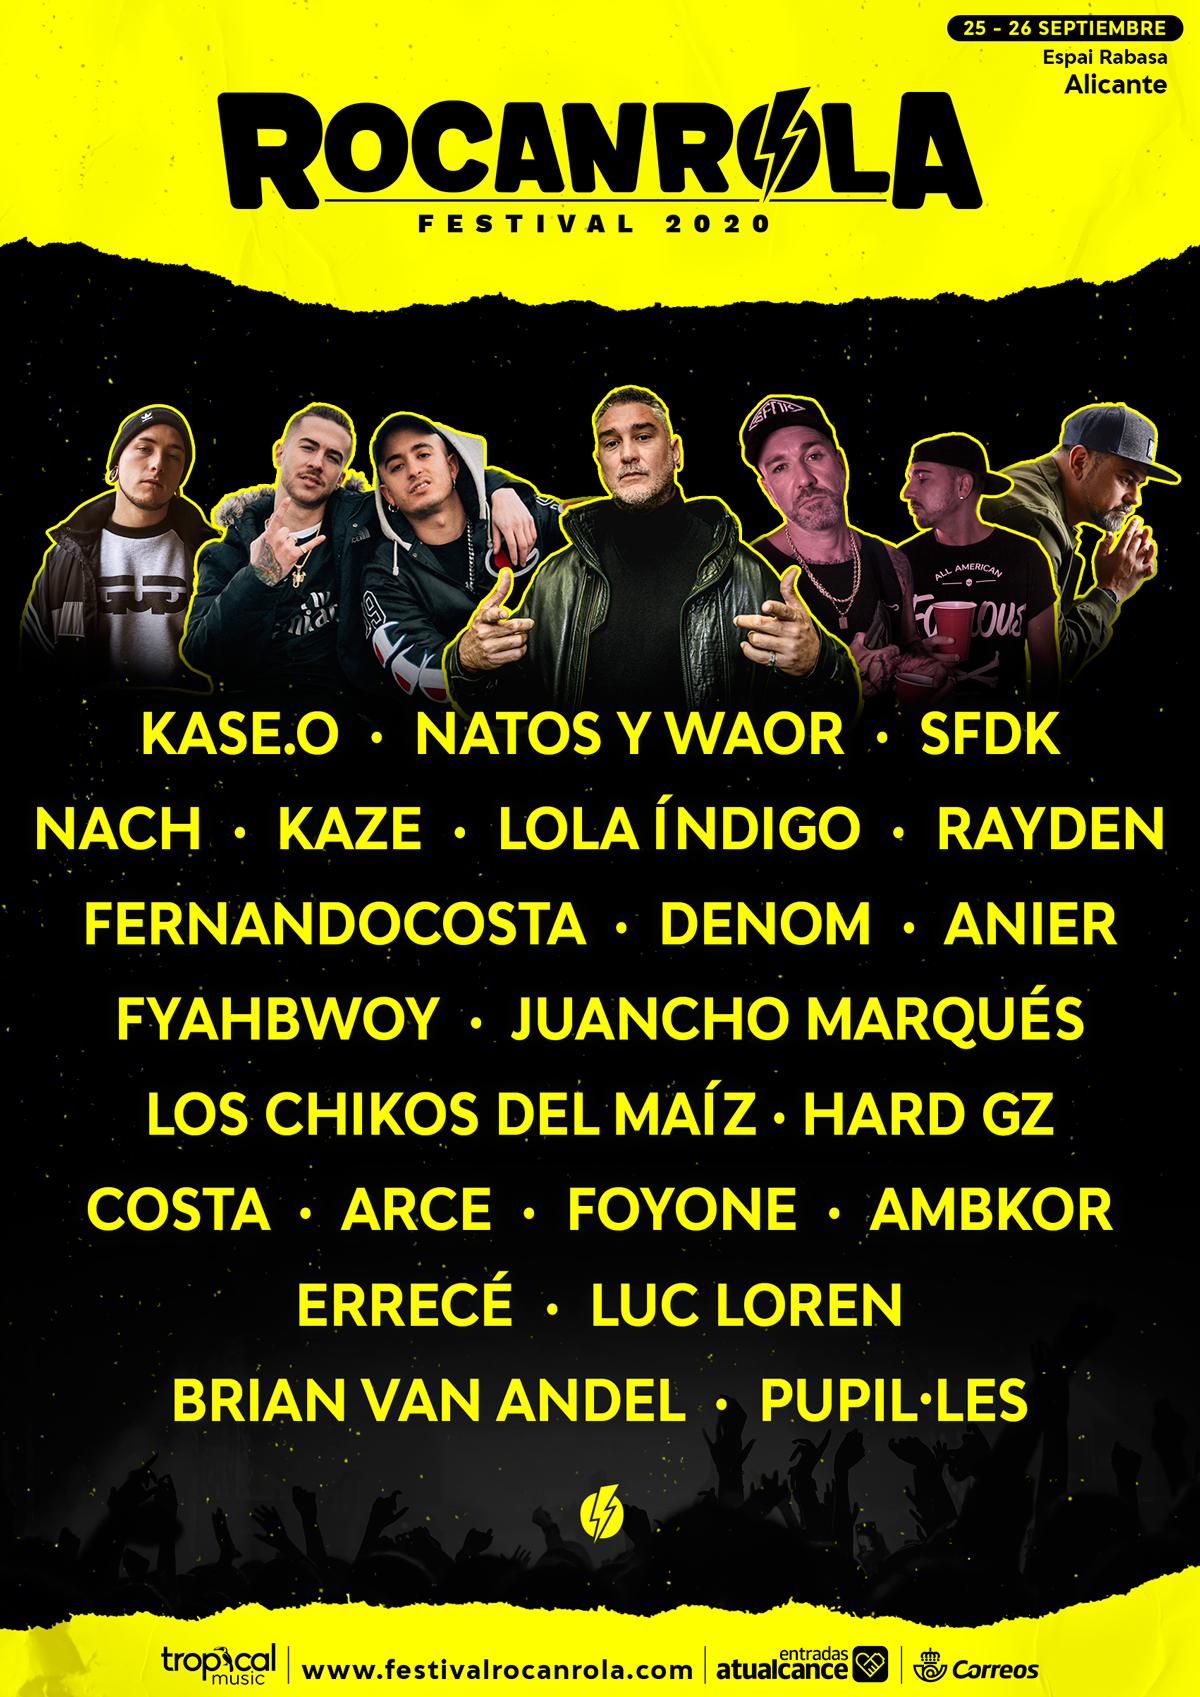 cambio-de-nombre-festival-rocanrola-5e8606b1b0633.png